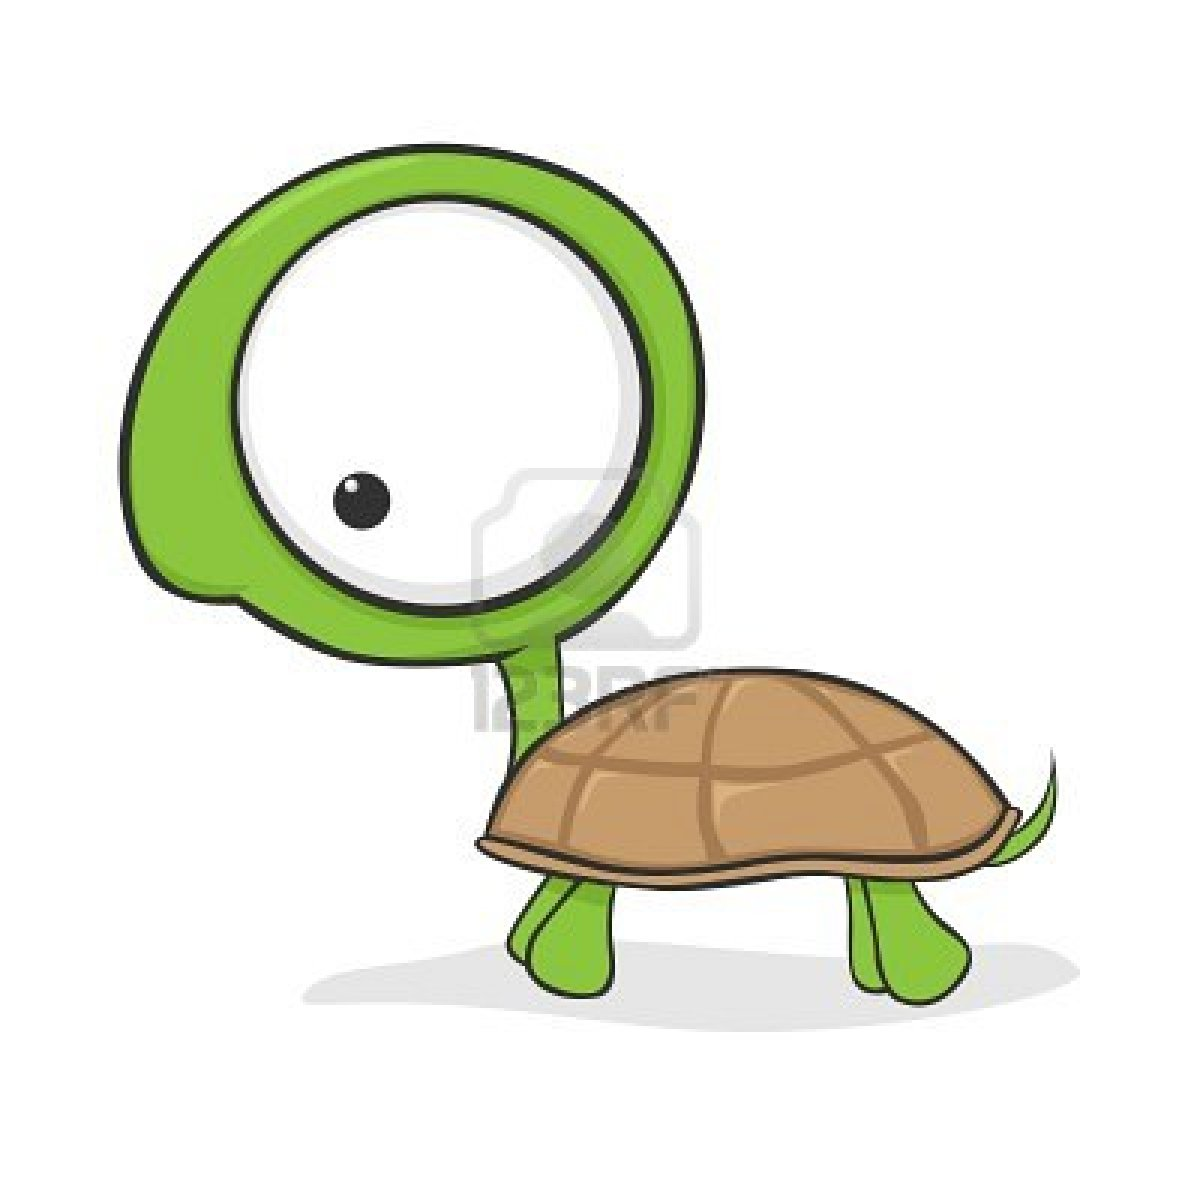 Drawn sea turtle big eye Stock eyes Photo cartoon huge